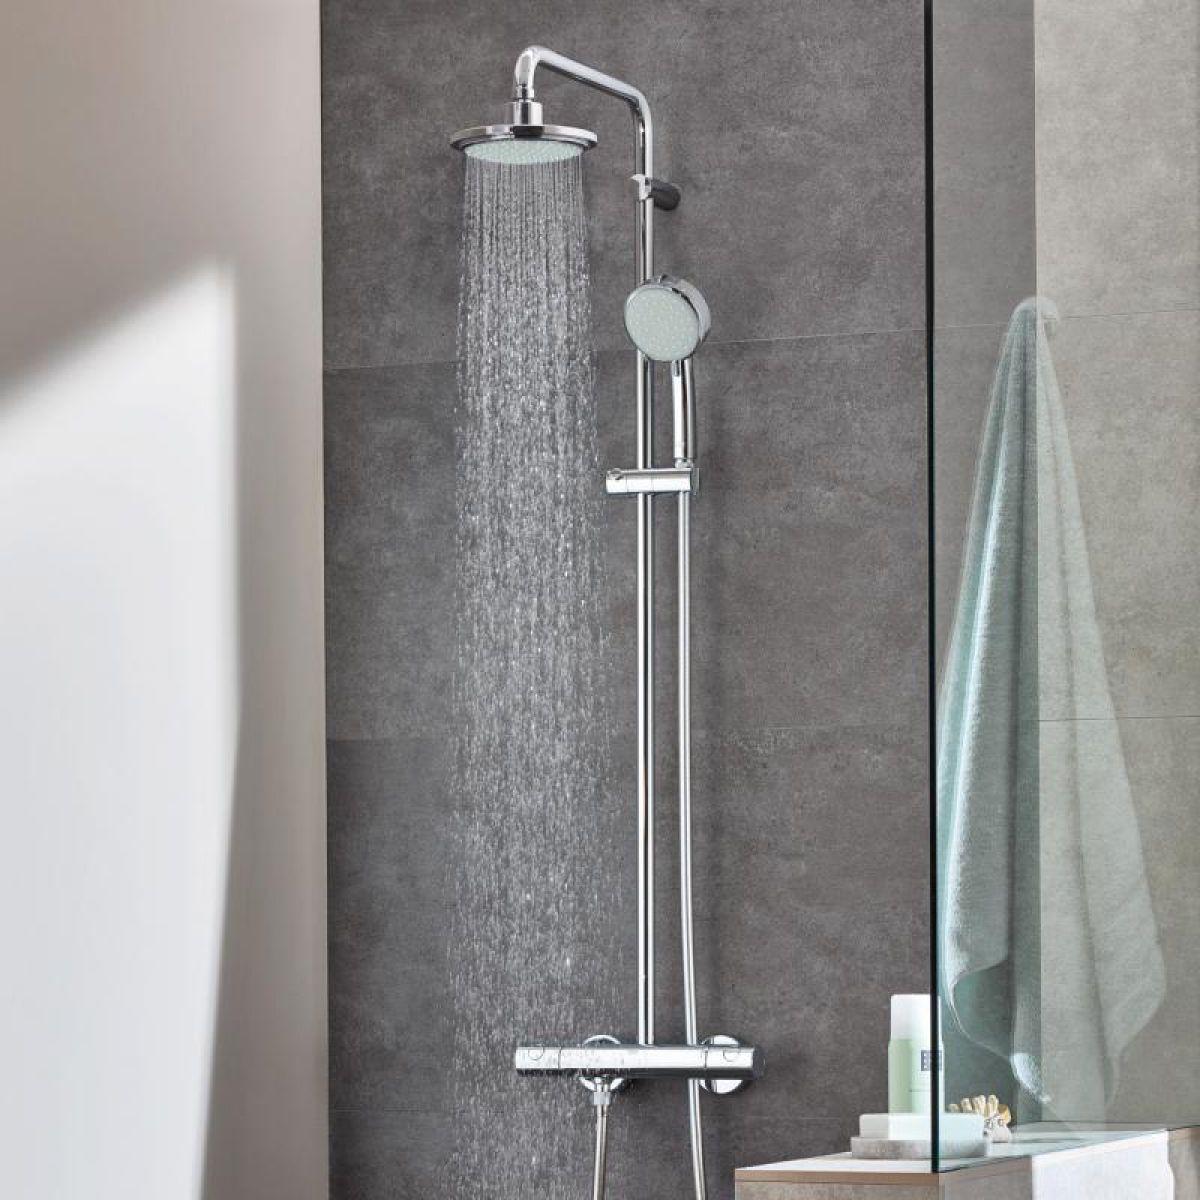 Grohe Tempesta Cosmopolitan 160 Shower System Uk Bathrooms